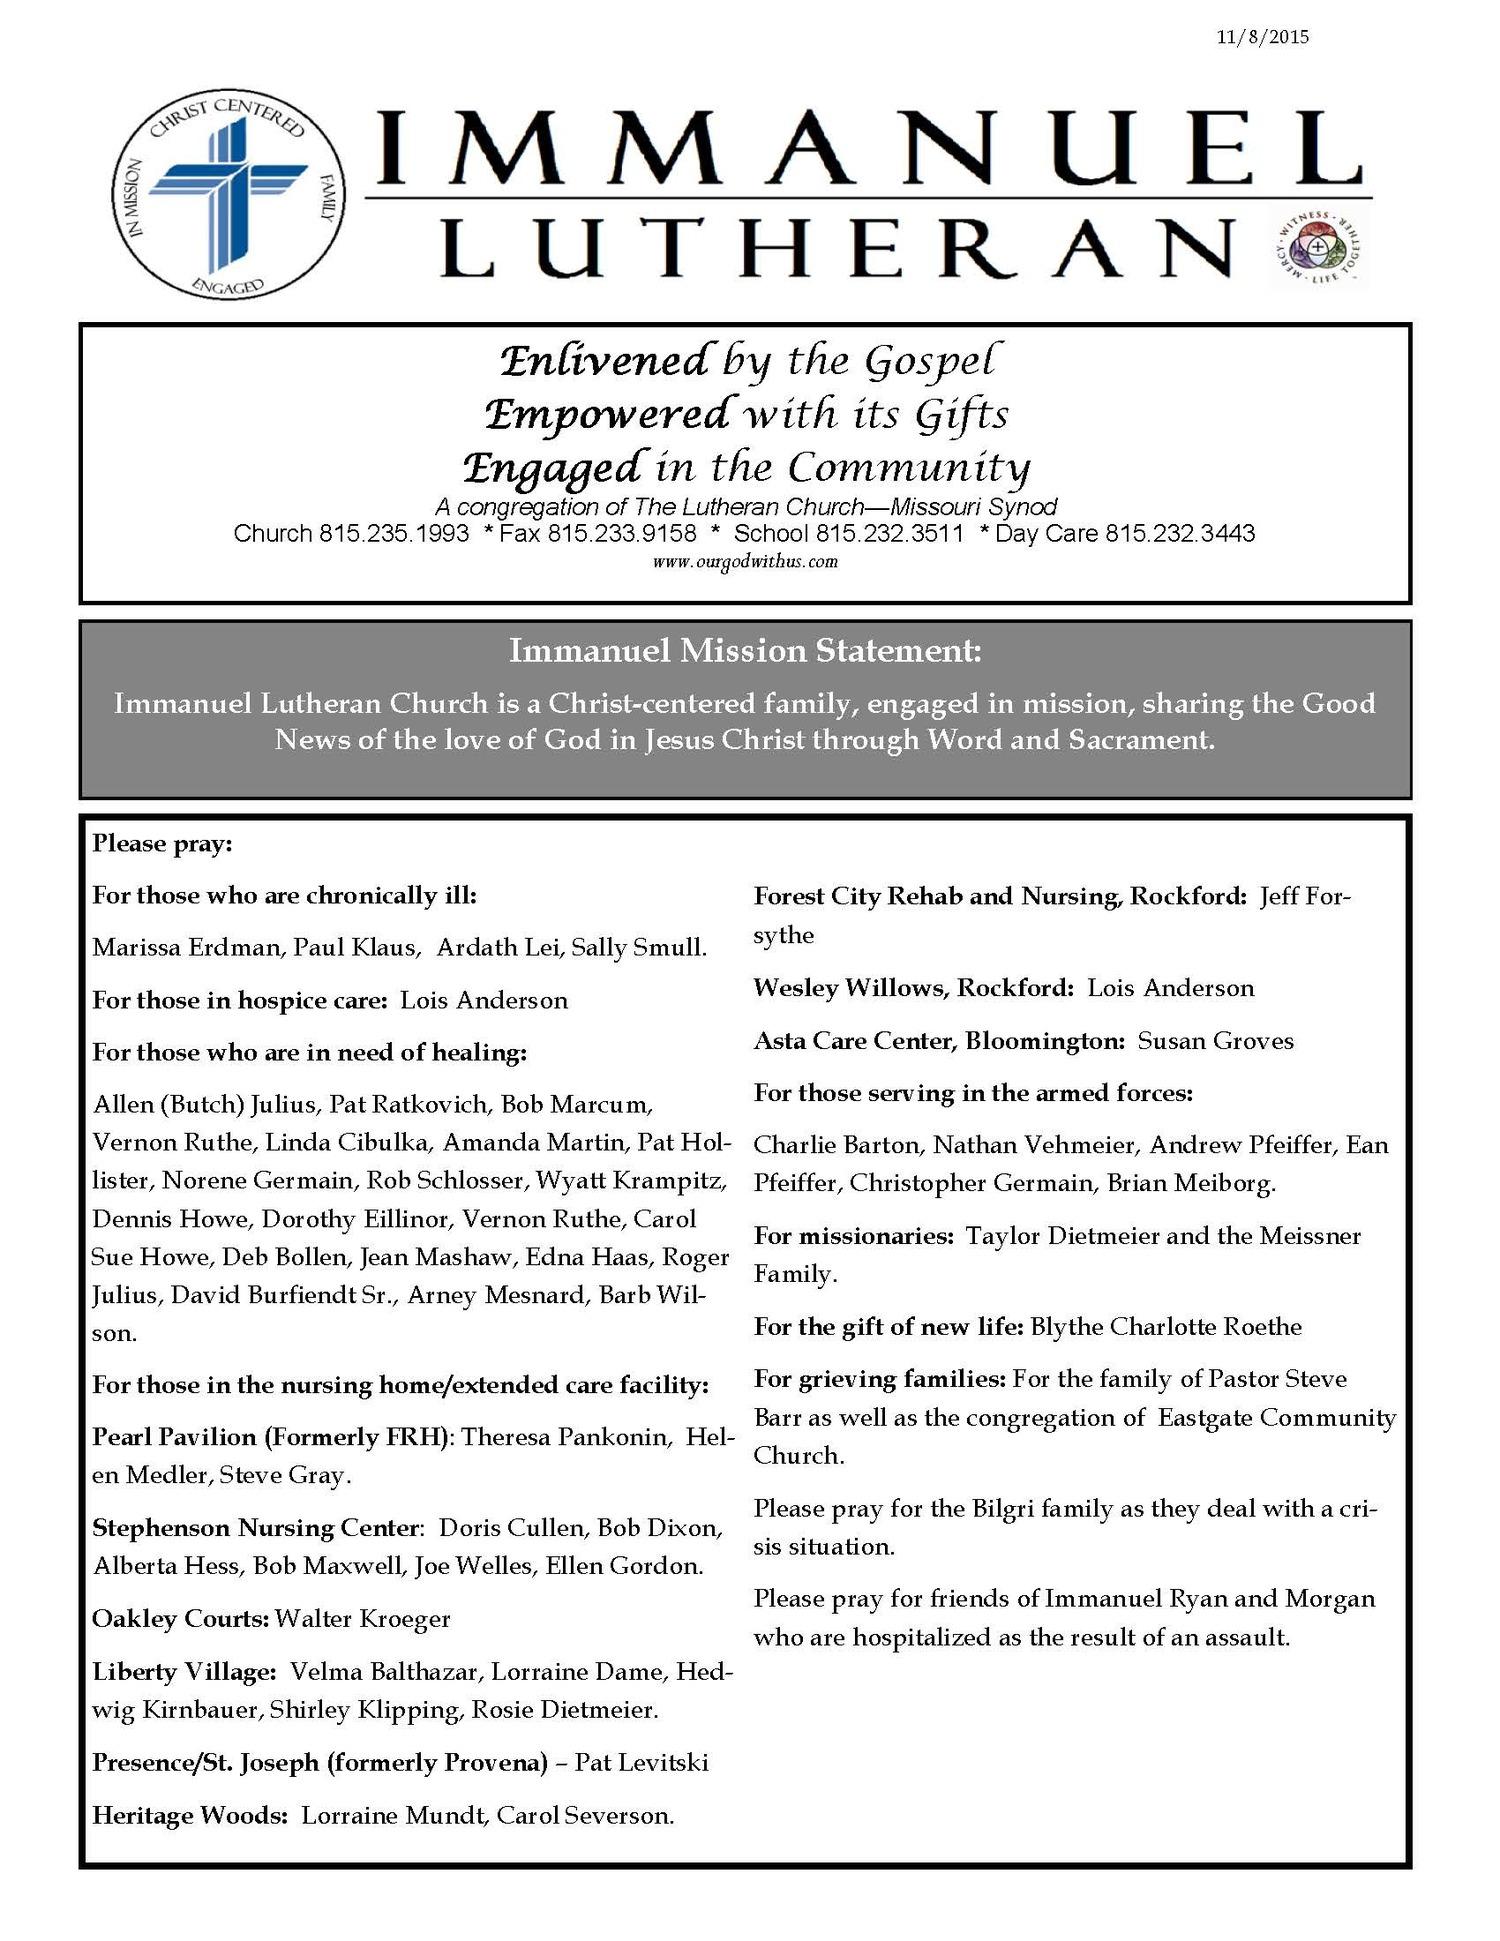 November 8, 2015 Bulletin — Immanuel Lutheran Church and School